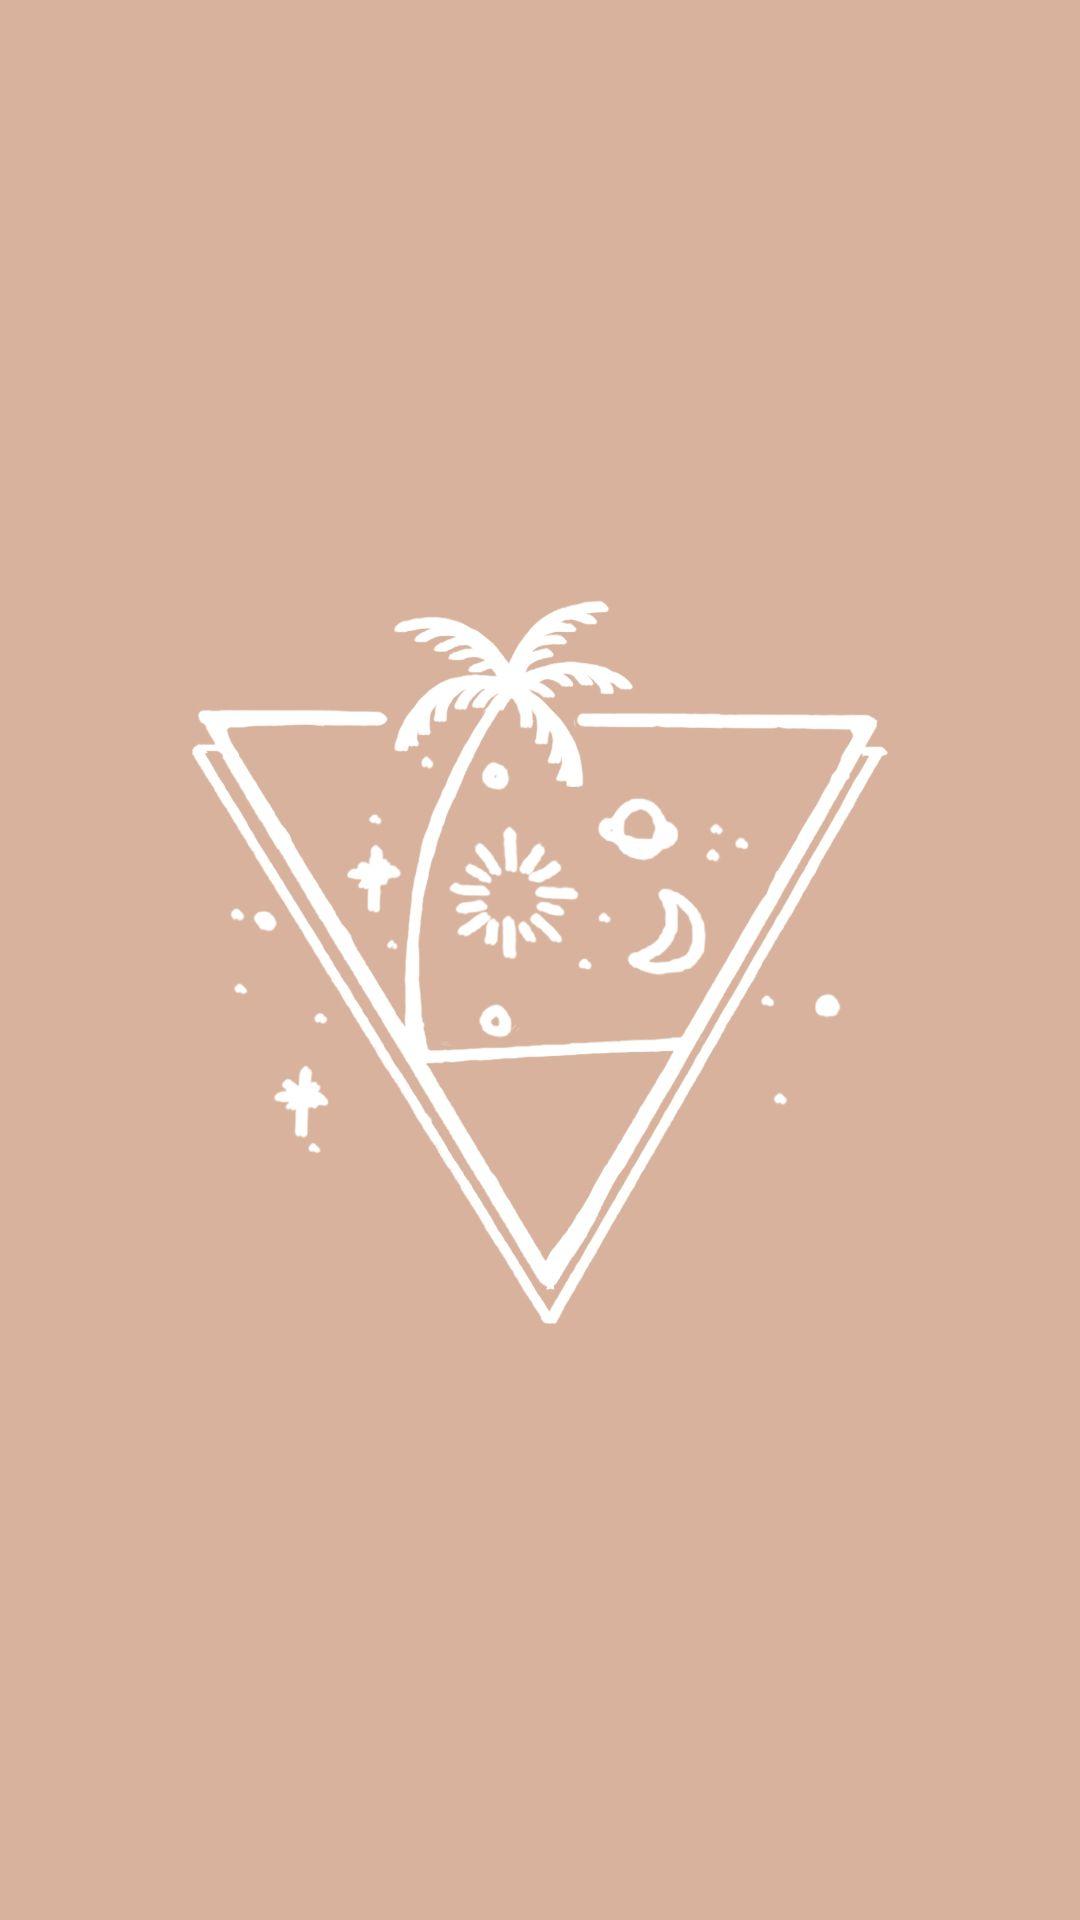 bohemian summer instagram highlight icons instagram icons instagram aesthetic pinterest